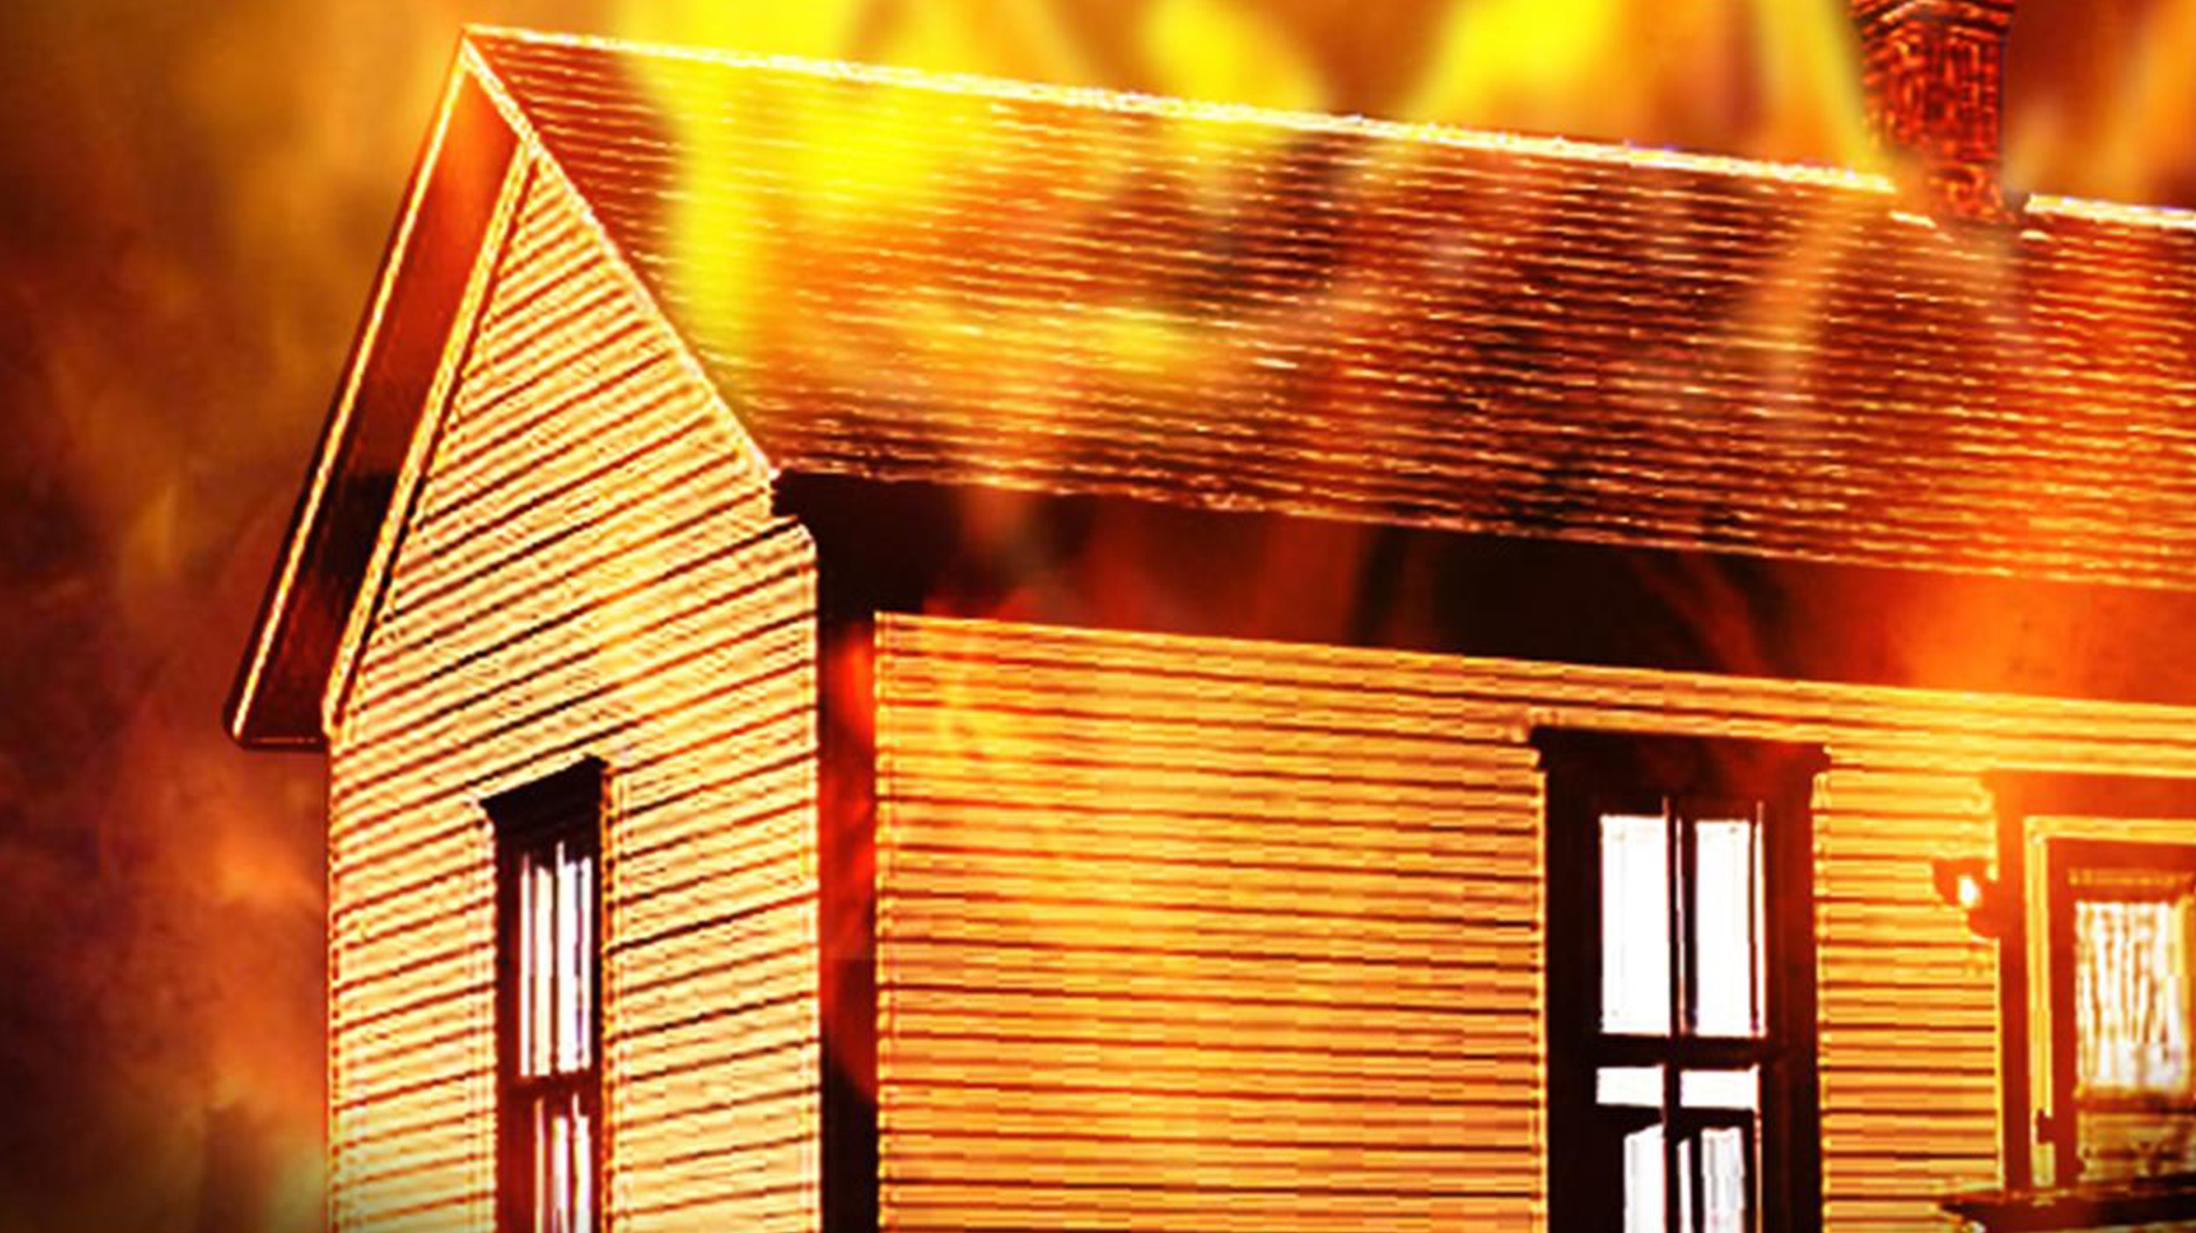 House Fire_1450284008248.jpg